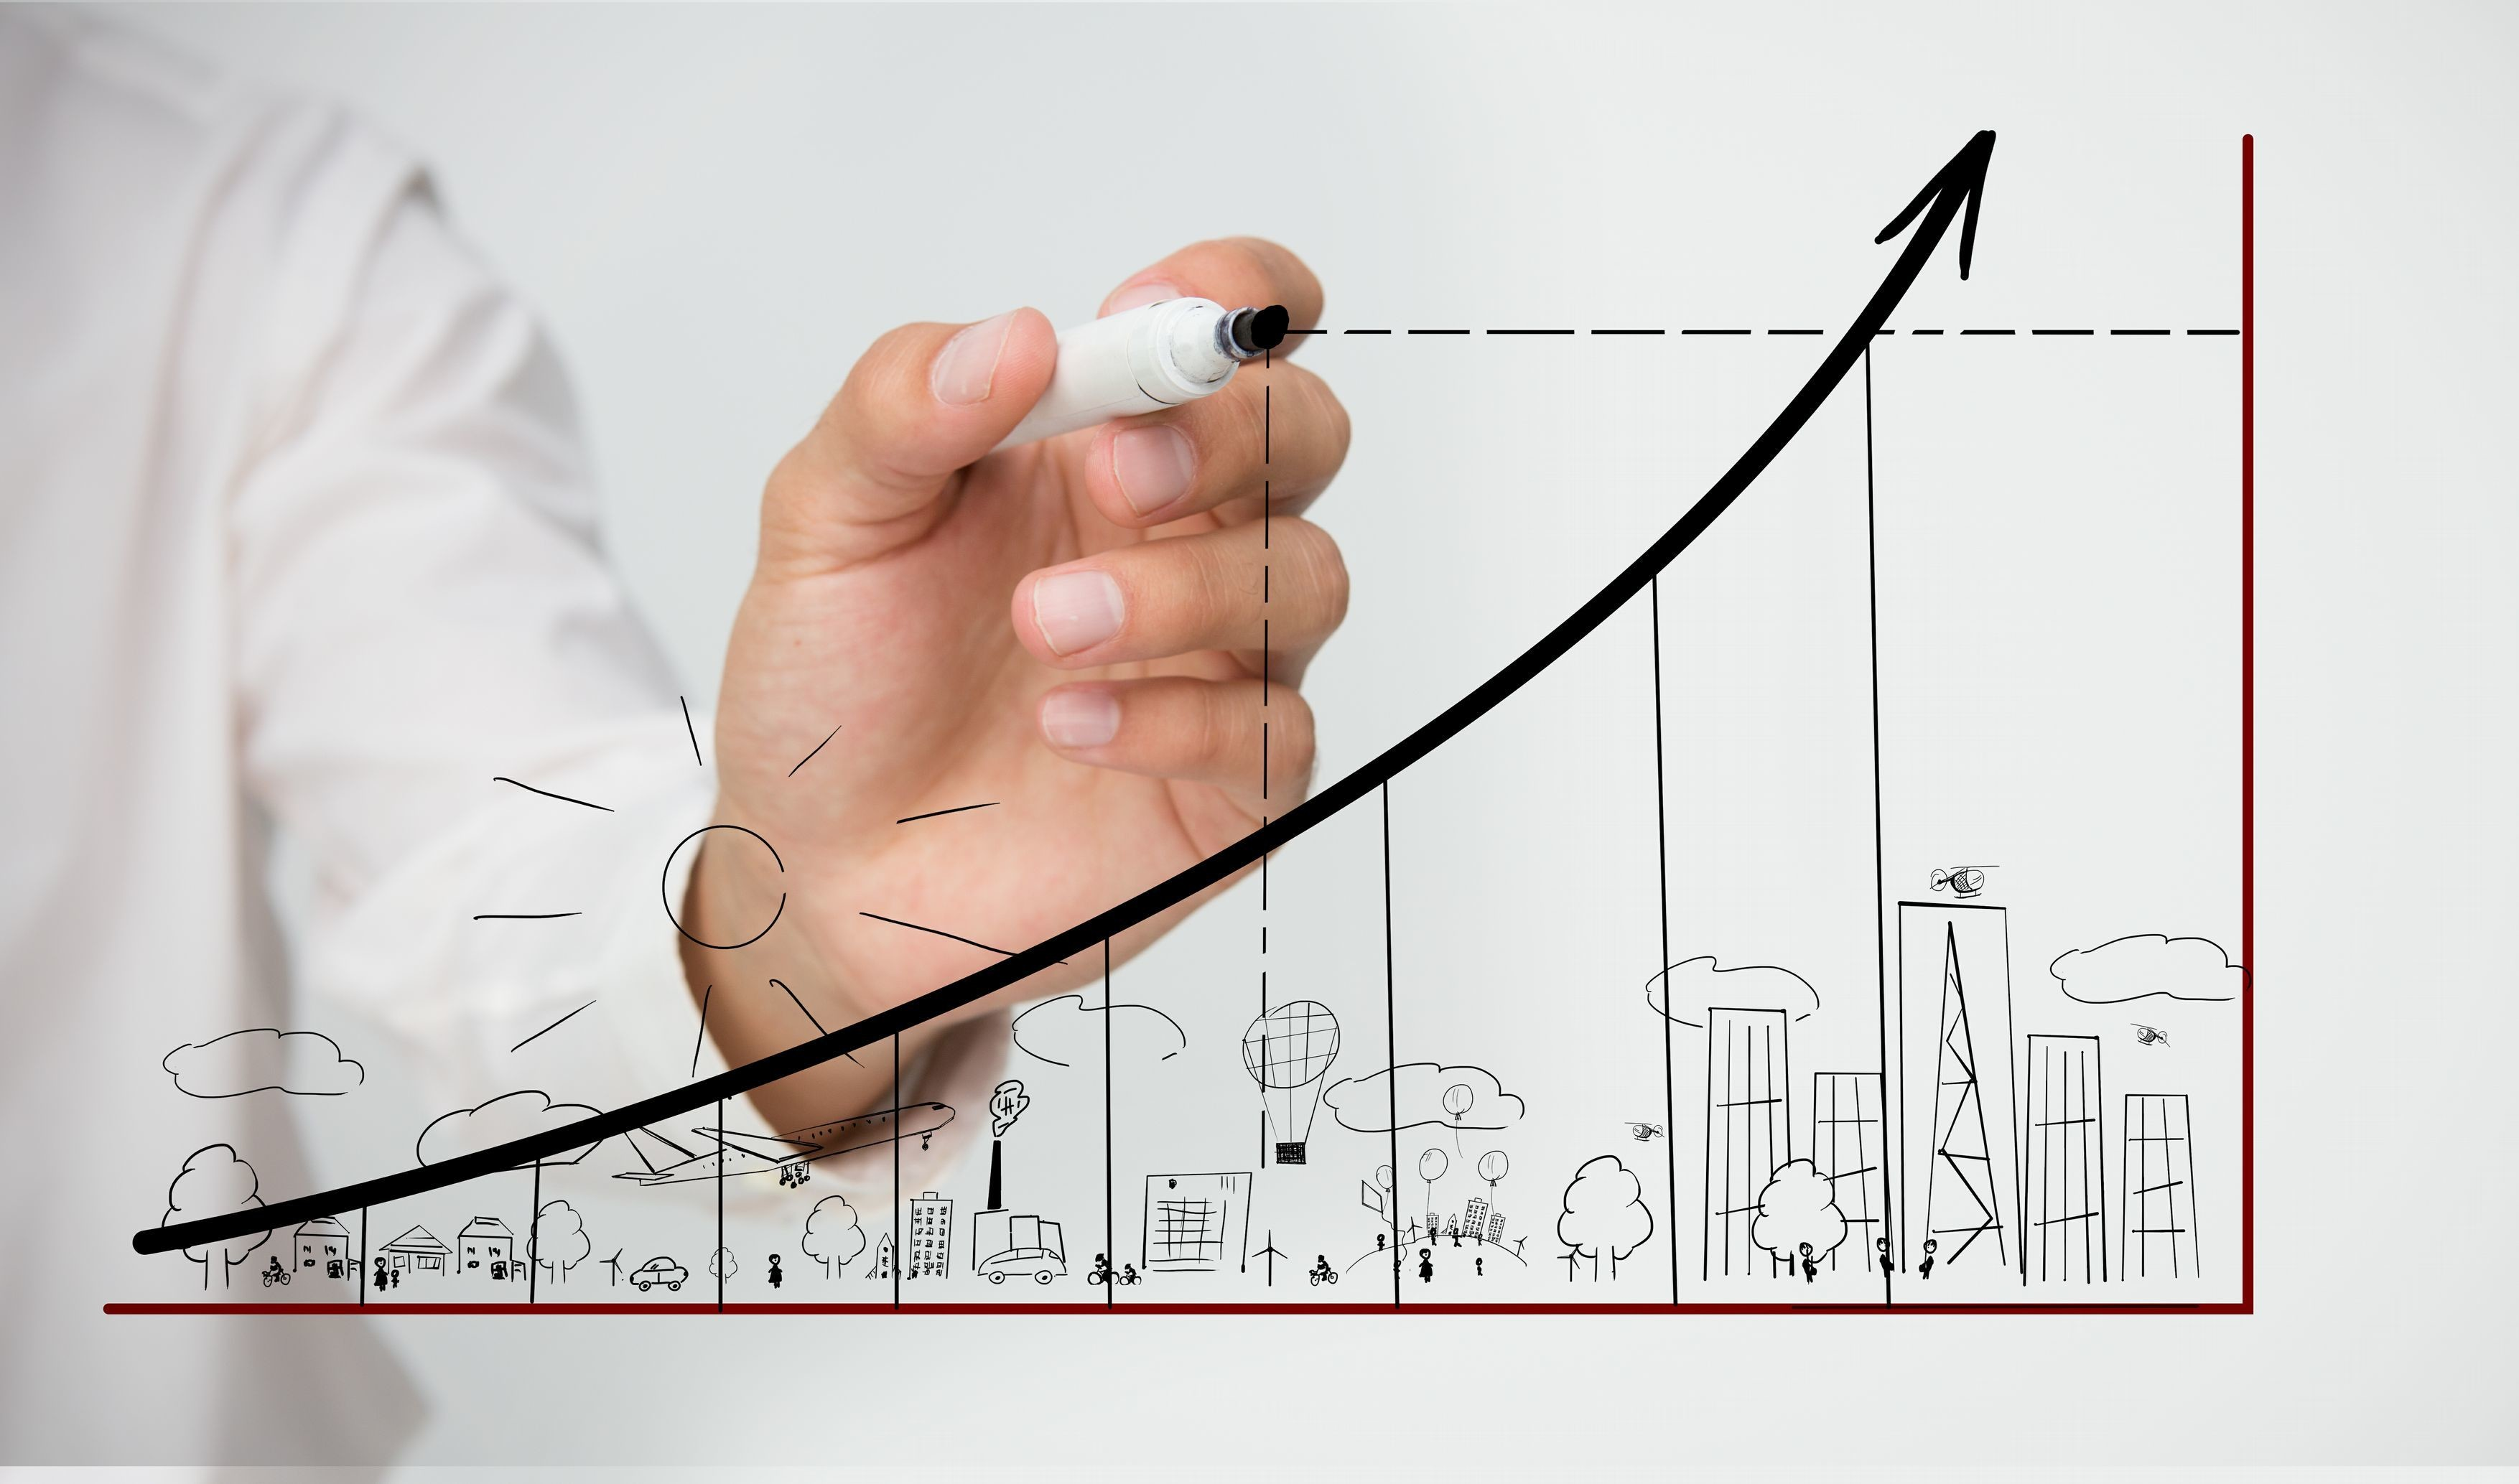 80%B2B创始人意识到要做品牌时,已错过了一个亿 | 专家视角